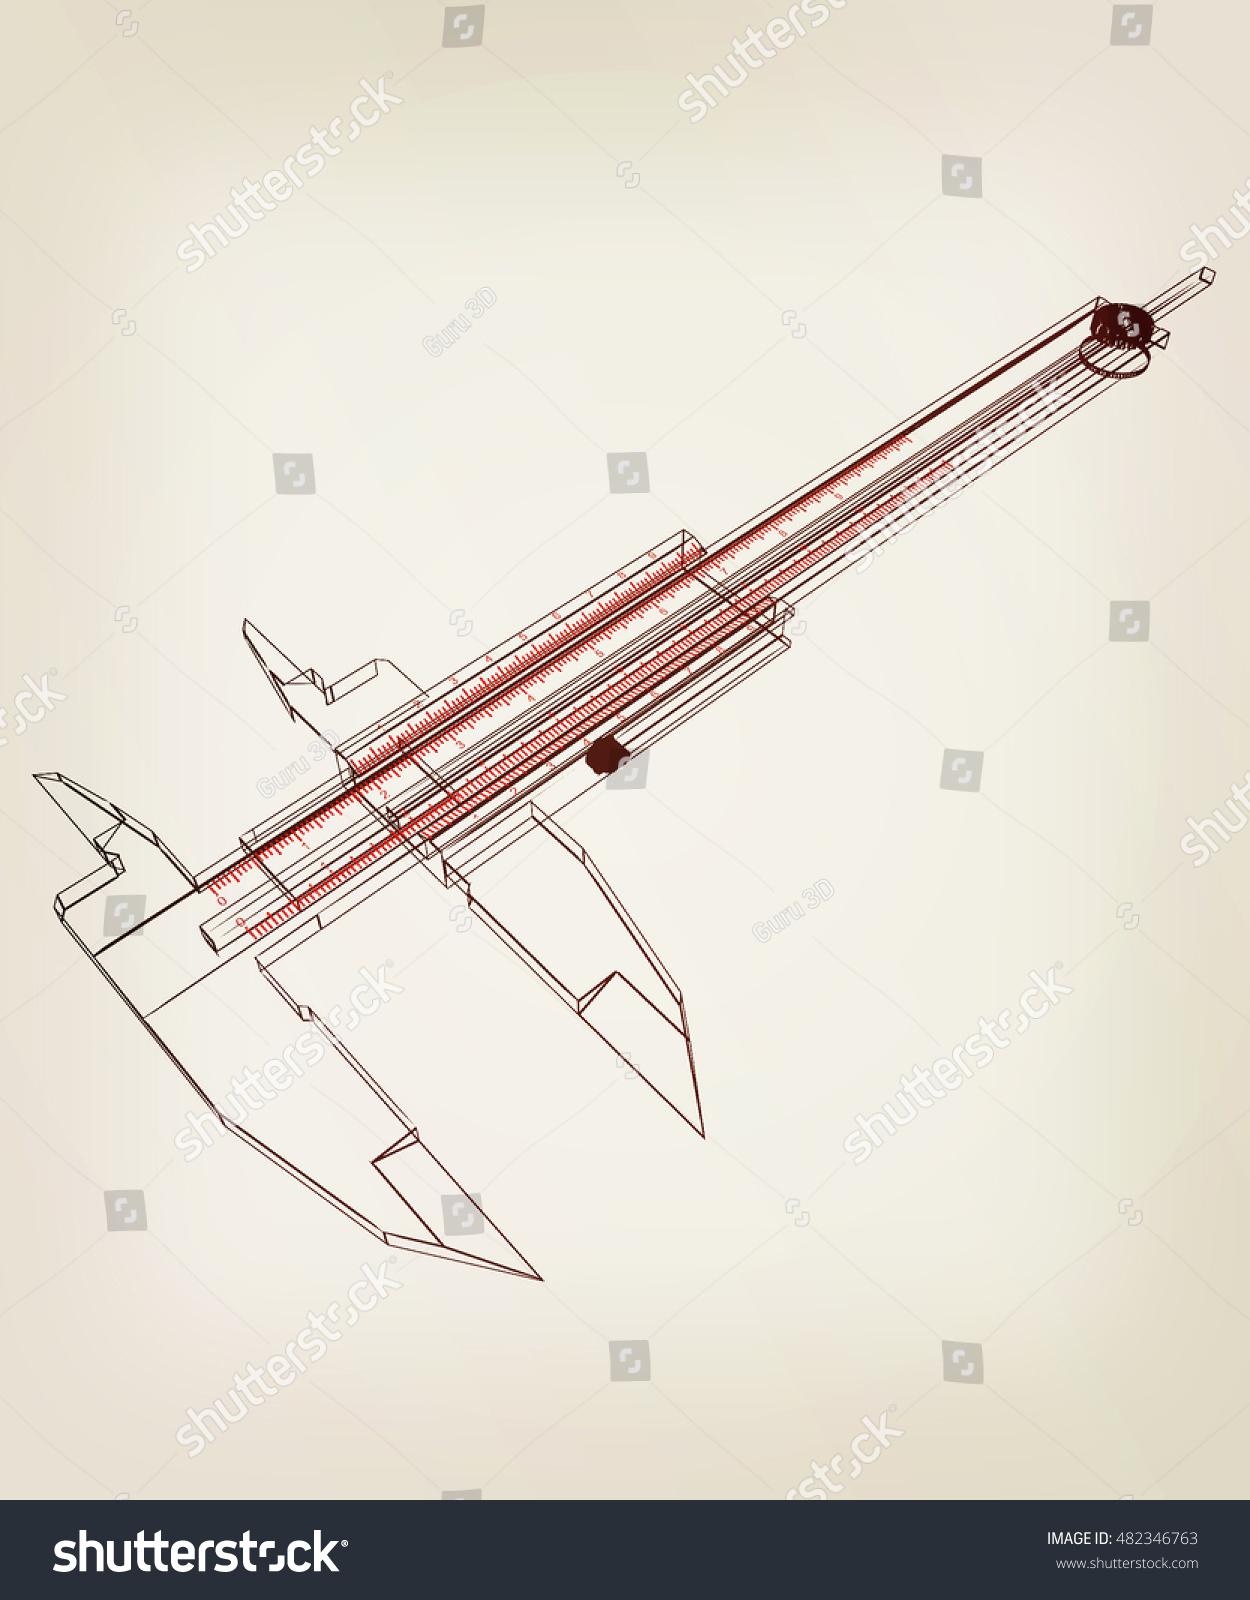 hight resolution of vernier caliper 3d illustration vintage style